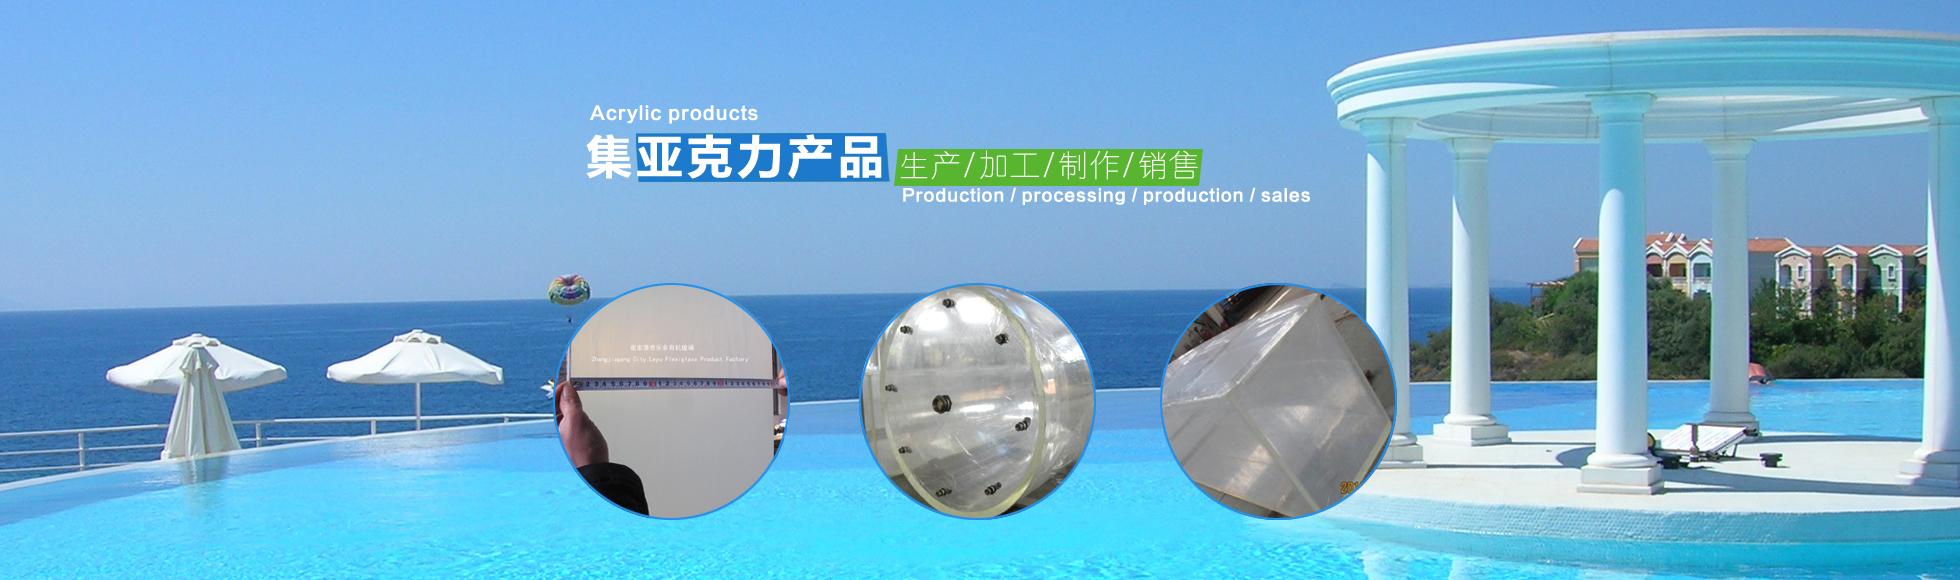 Acrylic Fish Tank, Acrylic Sheet, Acrylic Tunnel Supplier